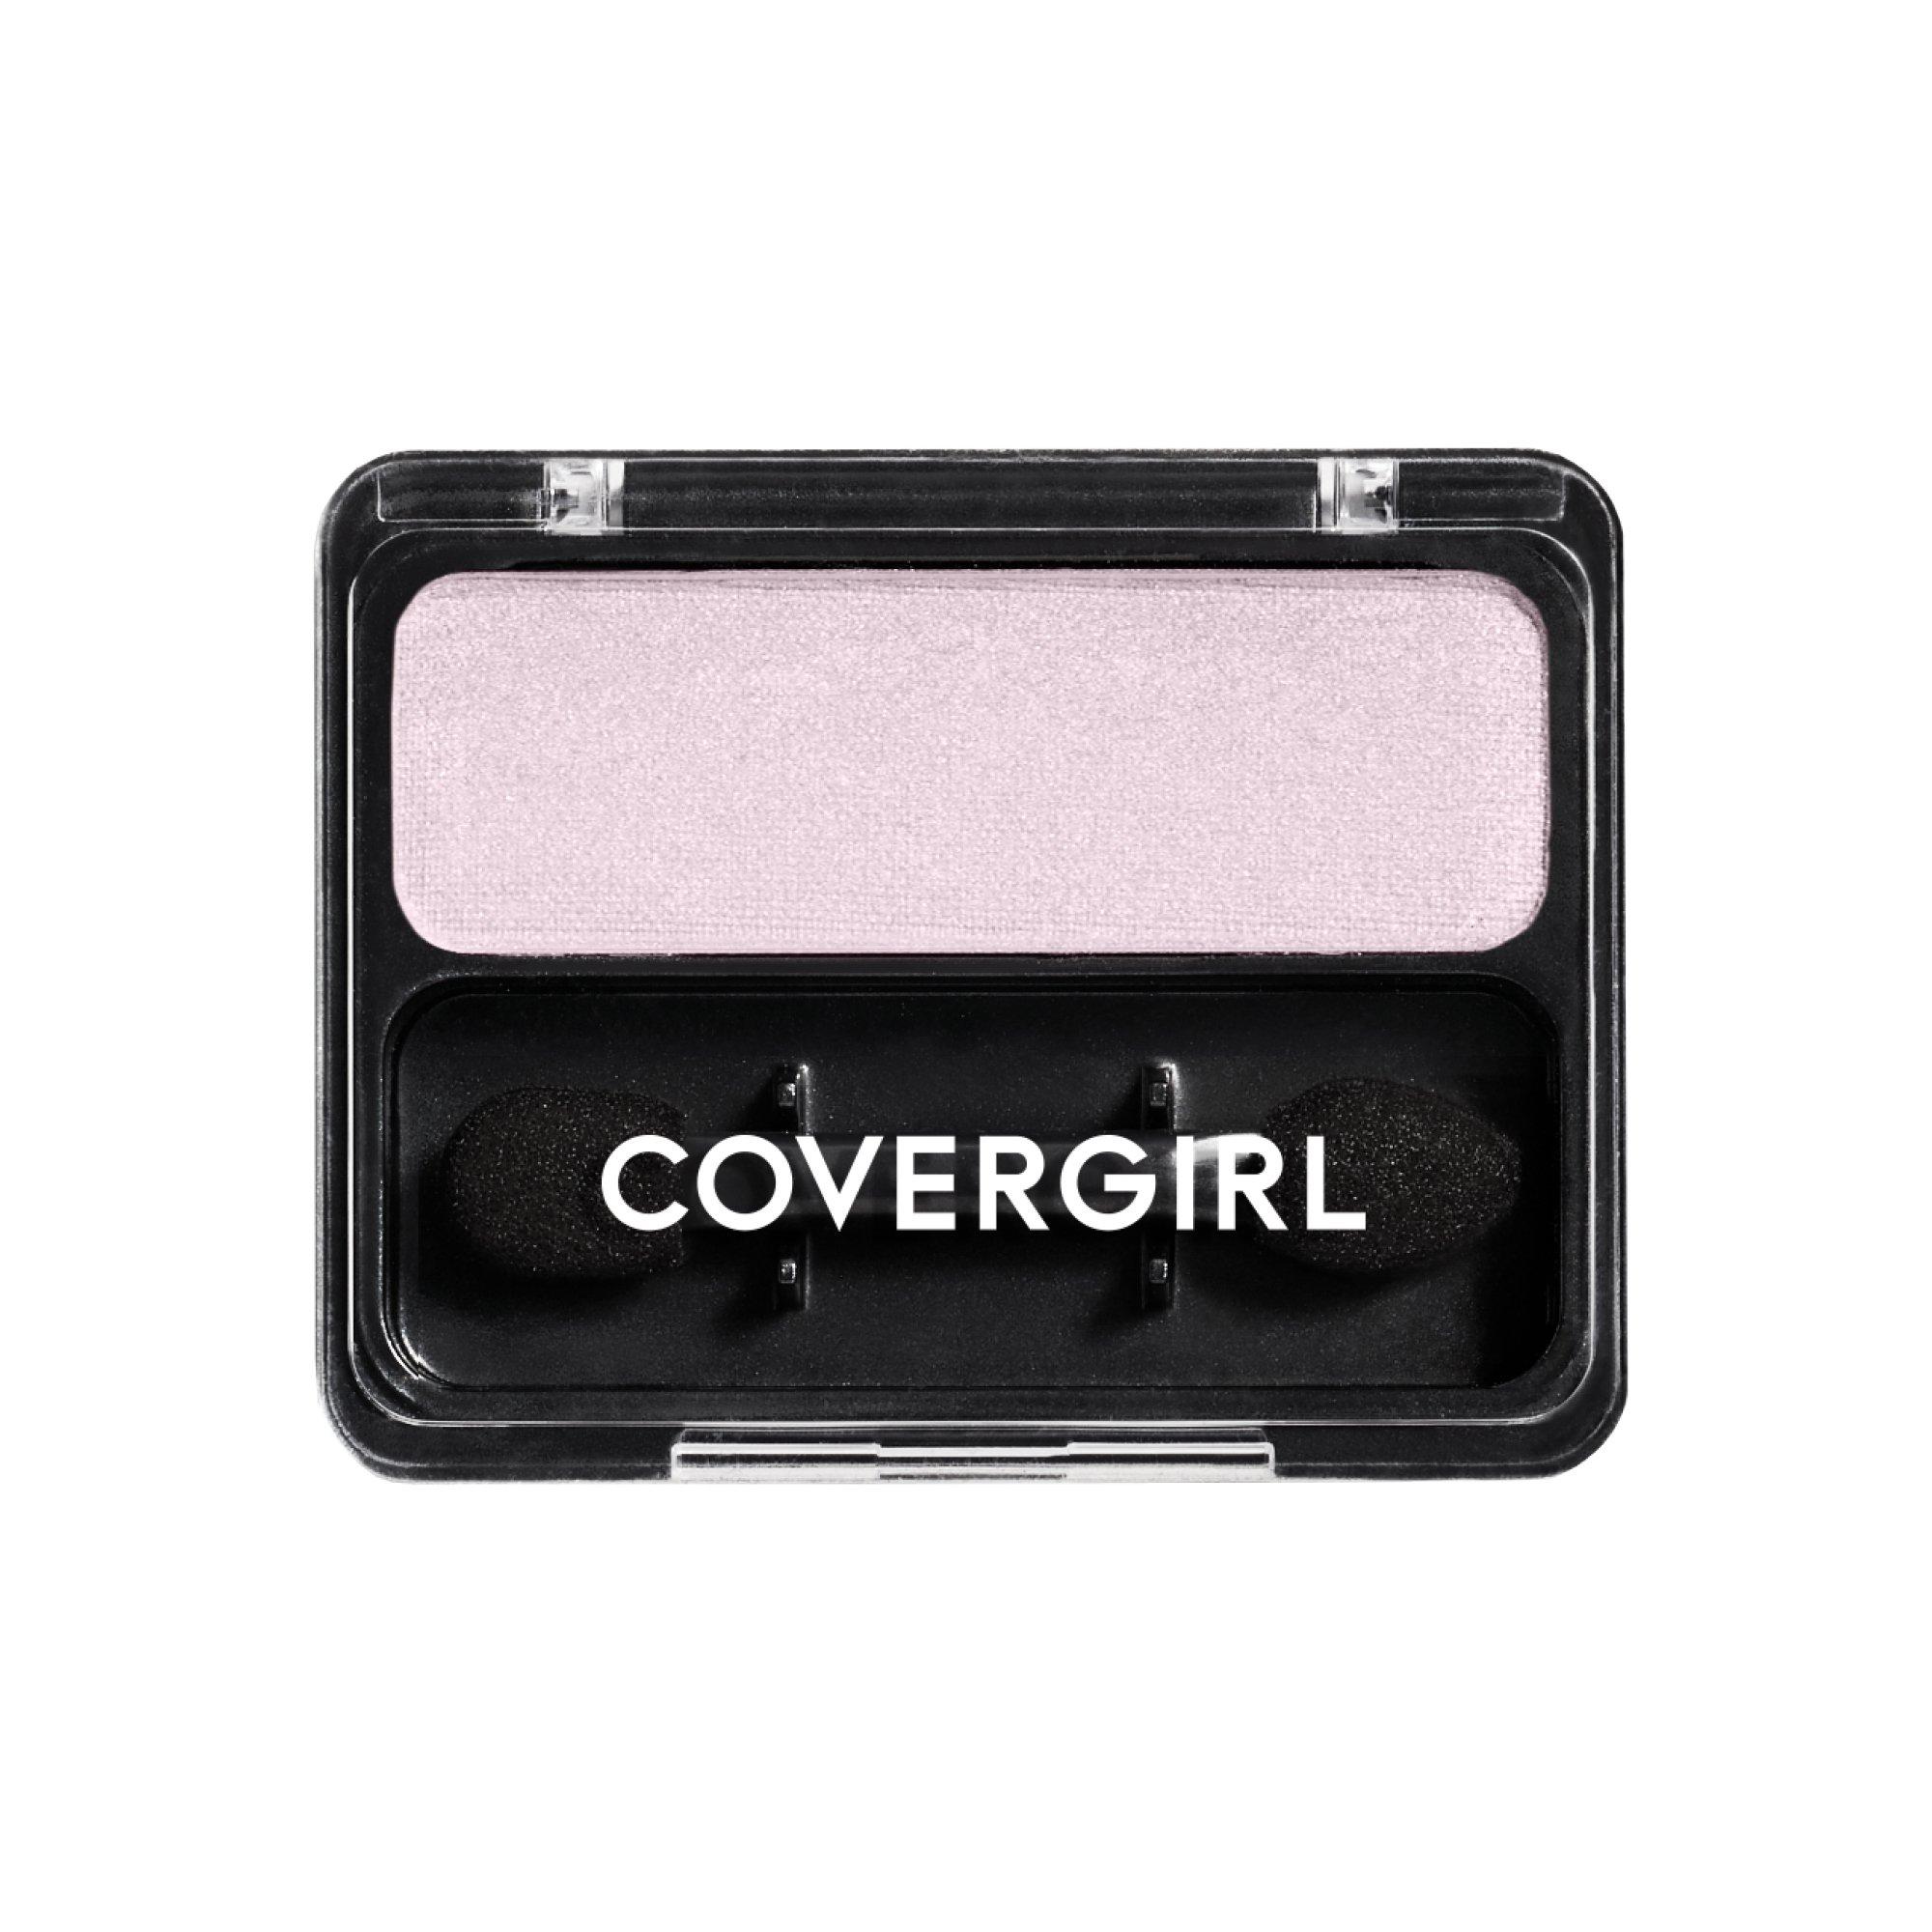 CoverGirl Eye Enhancers 540 Pink Chiffon